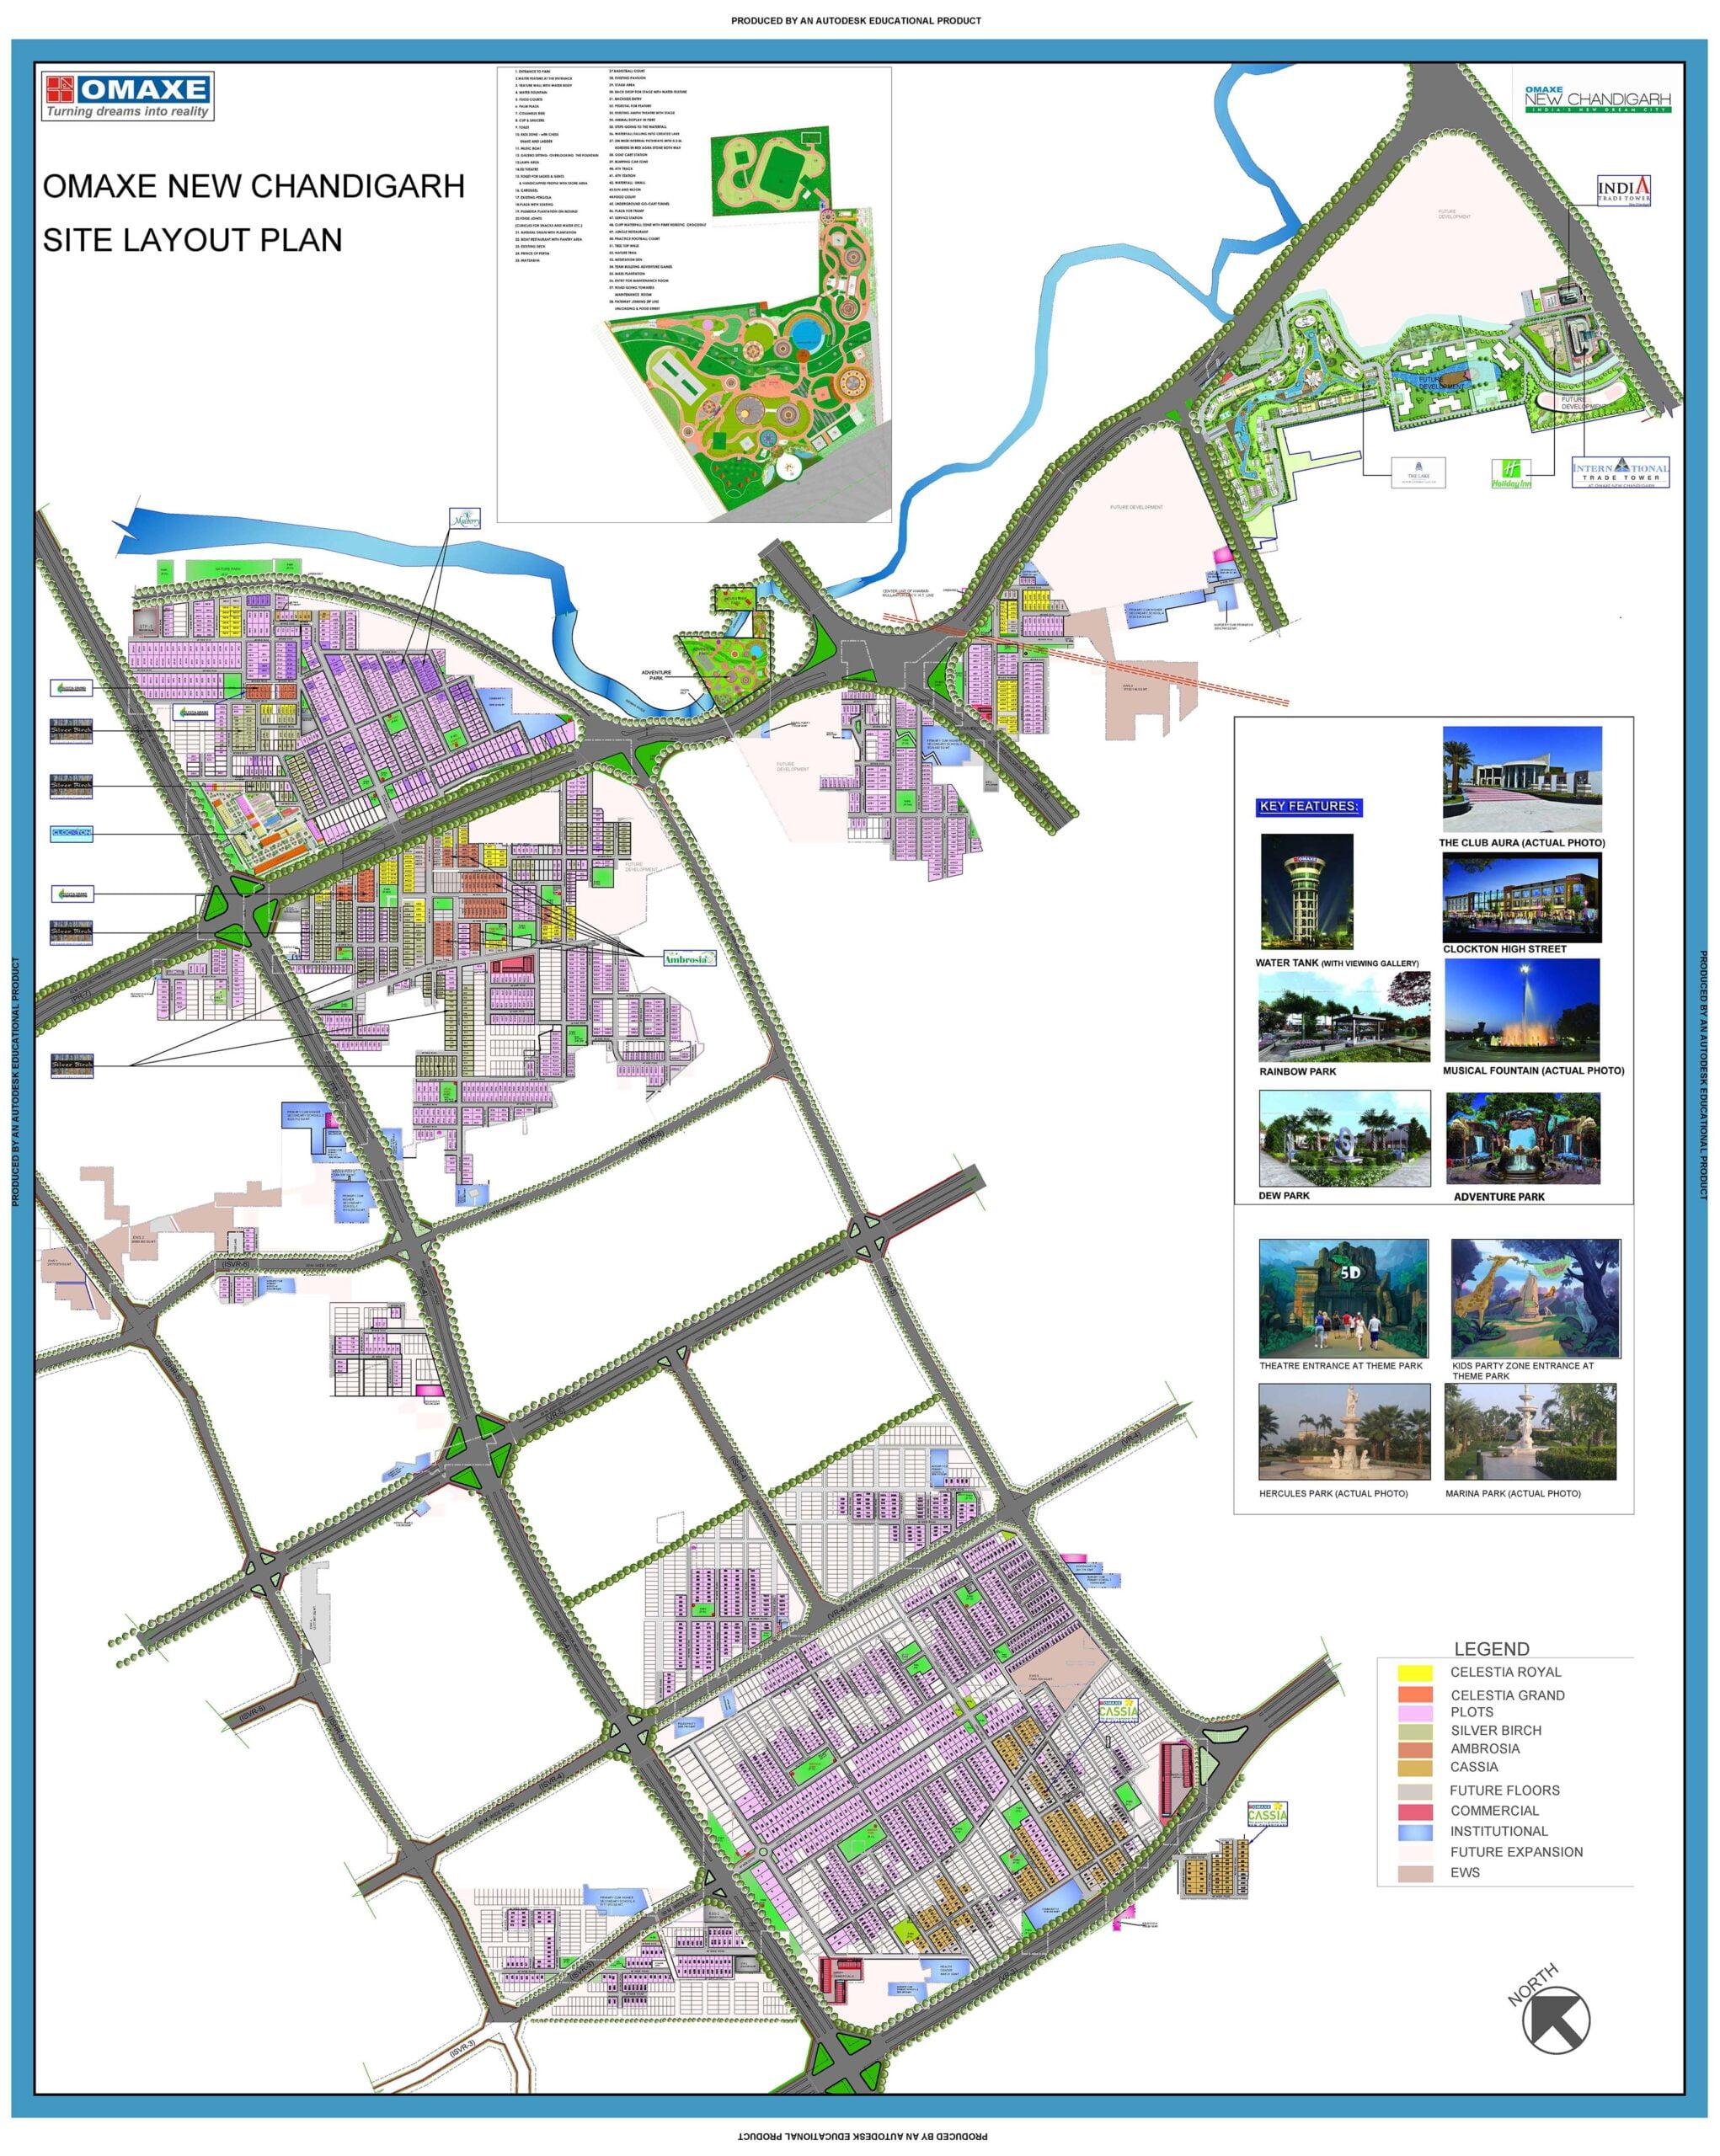 omaxe cassia site plan